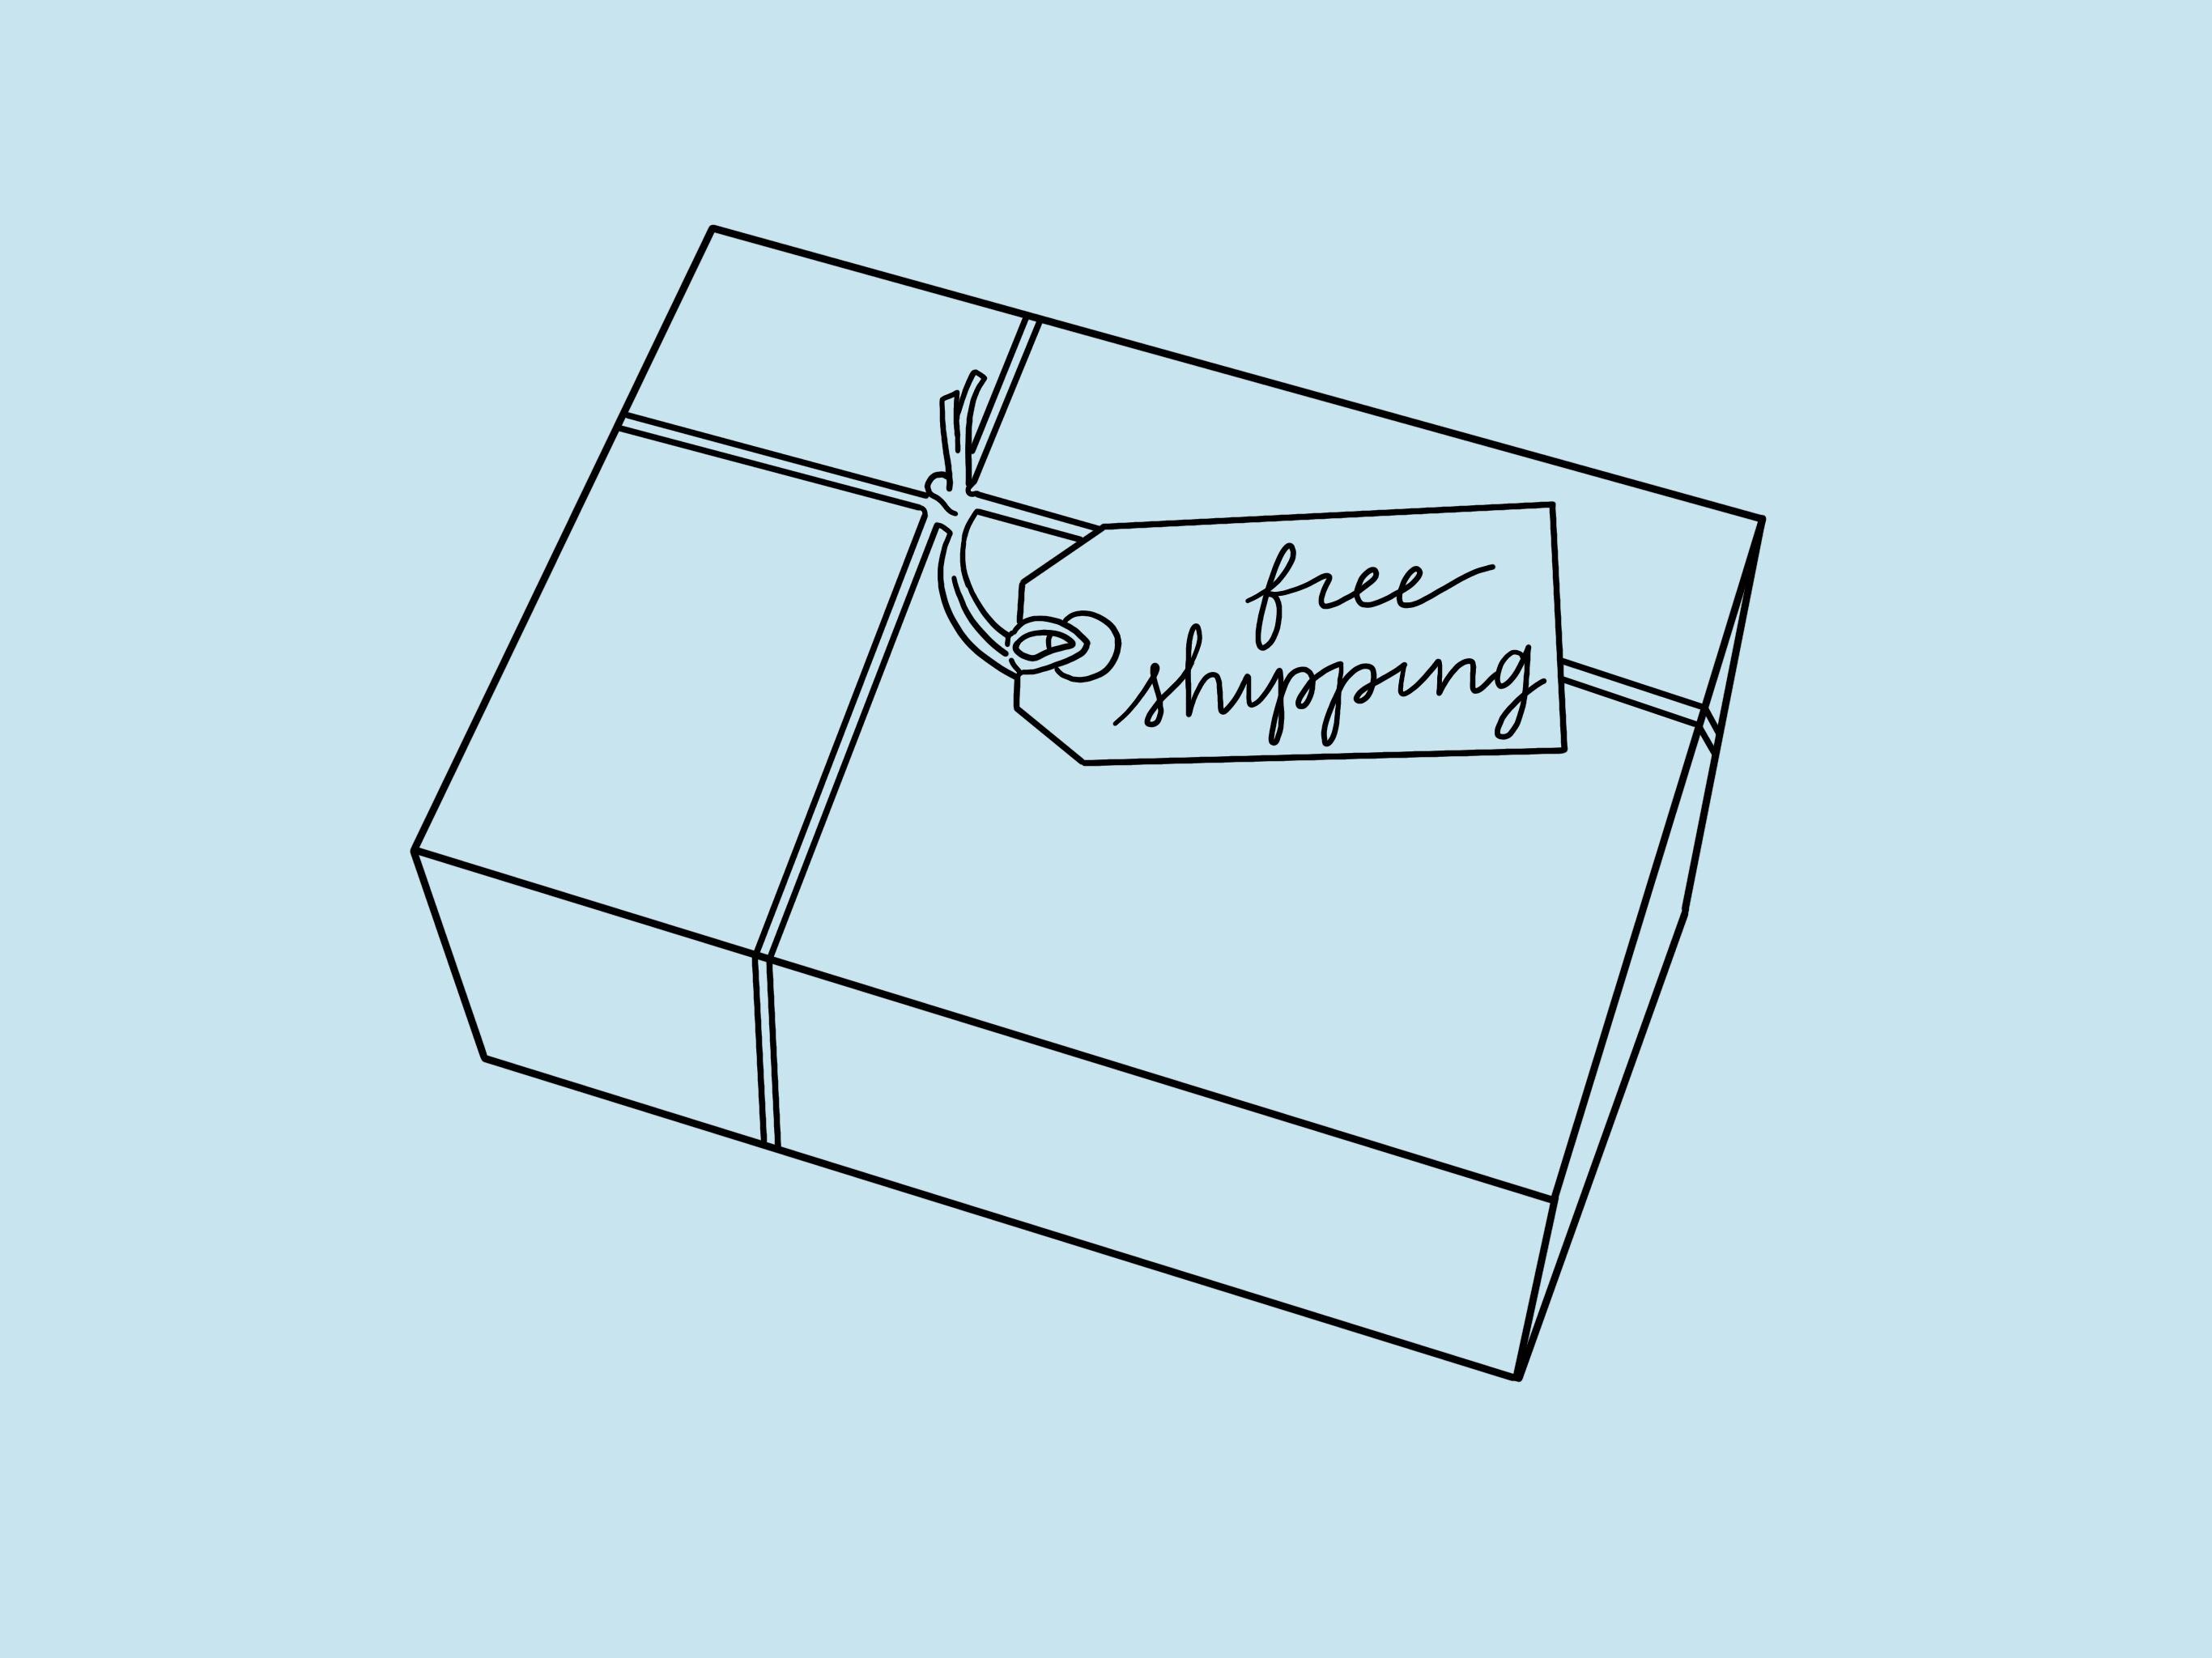 holiday marketing strategy free shipping